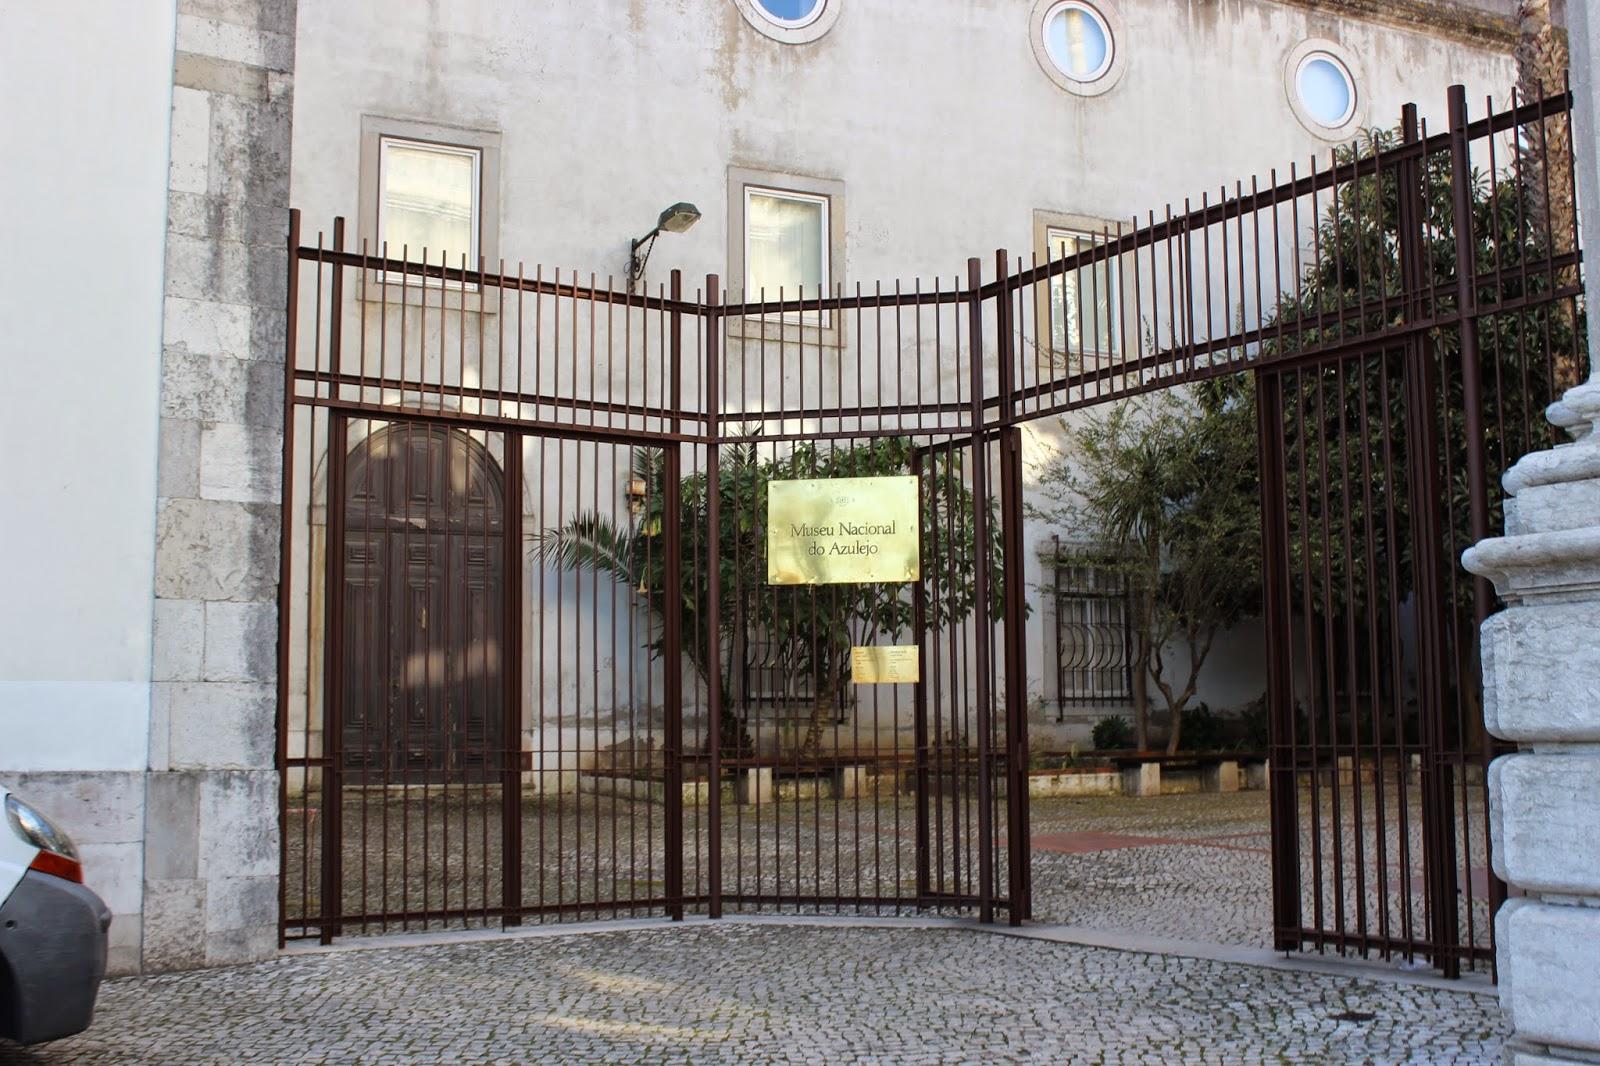 Tile Museum Portugal : The tile museum national azulejo lisbon portugal